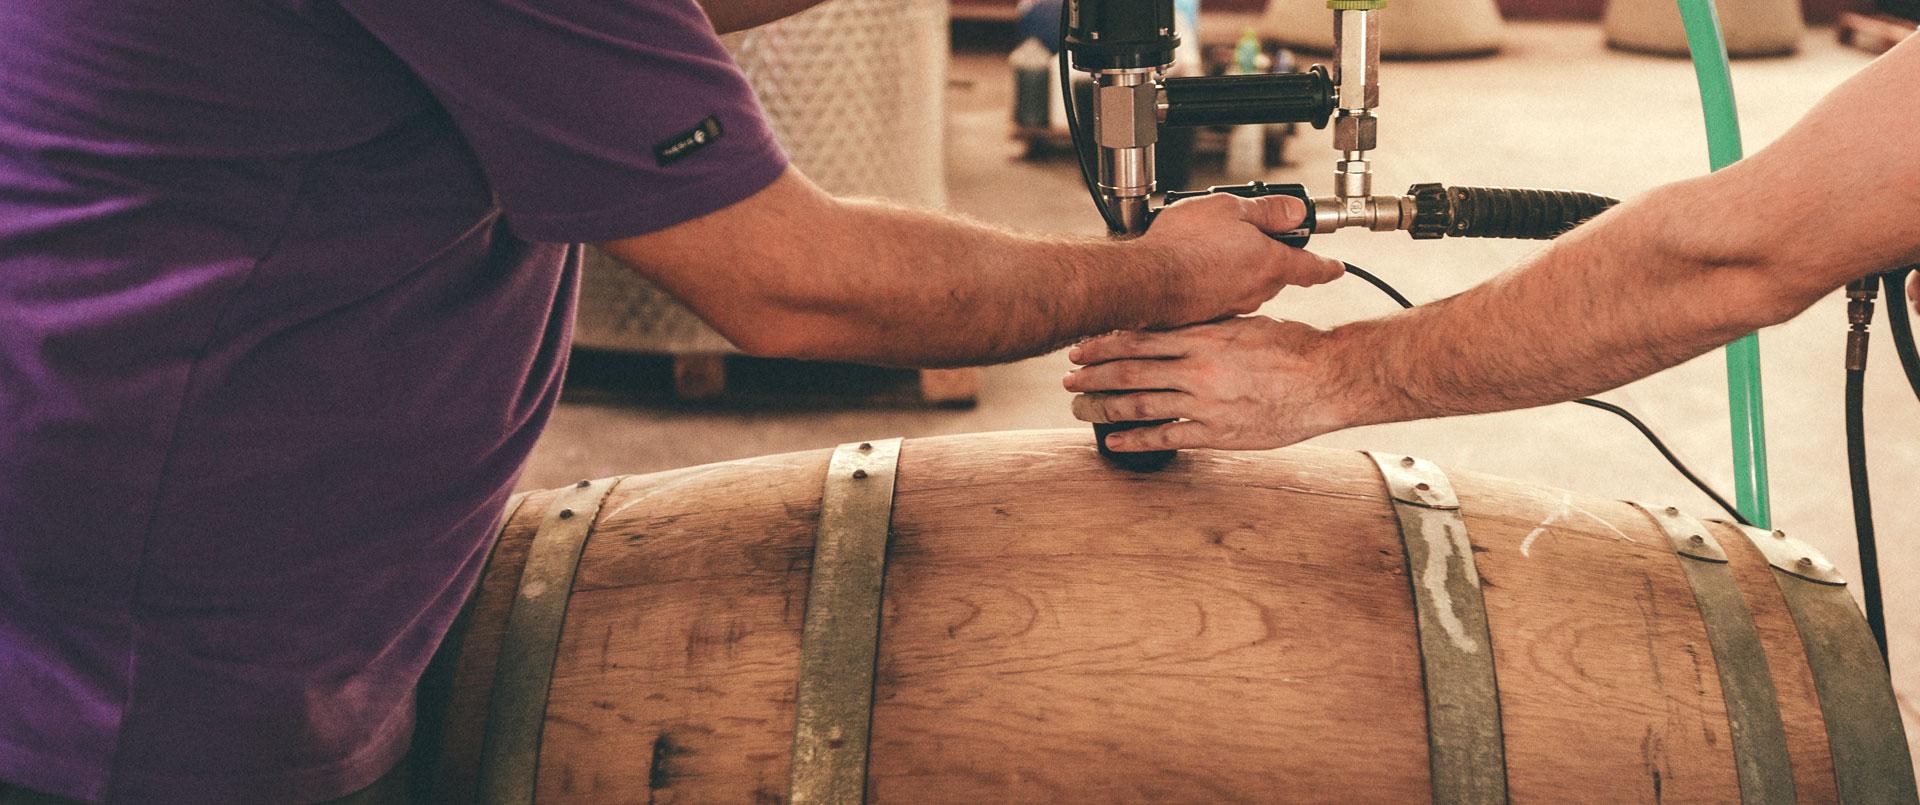 Elaboración de vinos de Bodegas Gratias